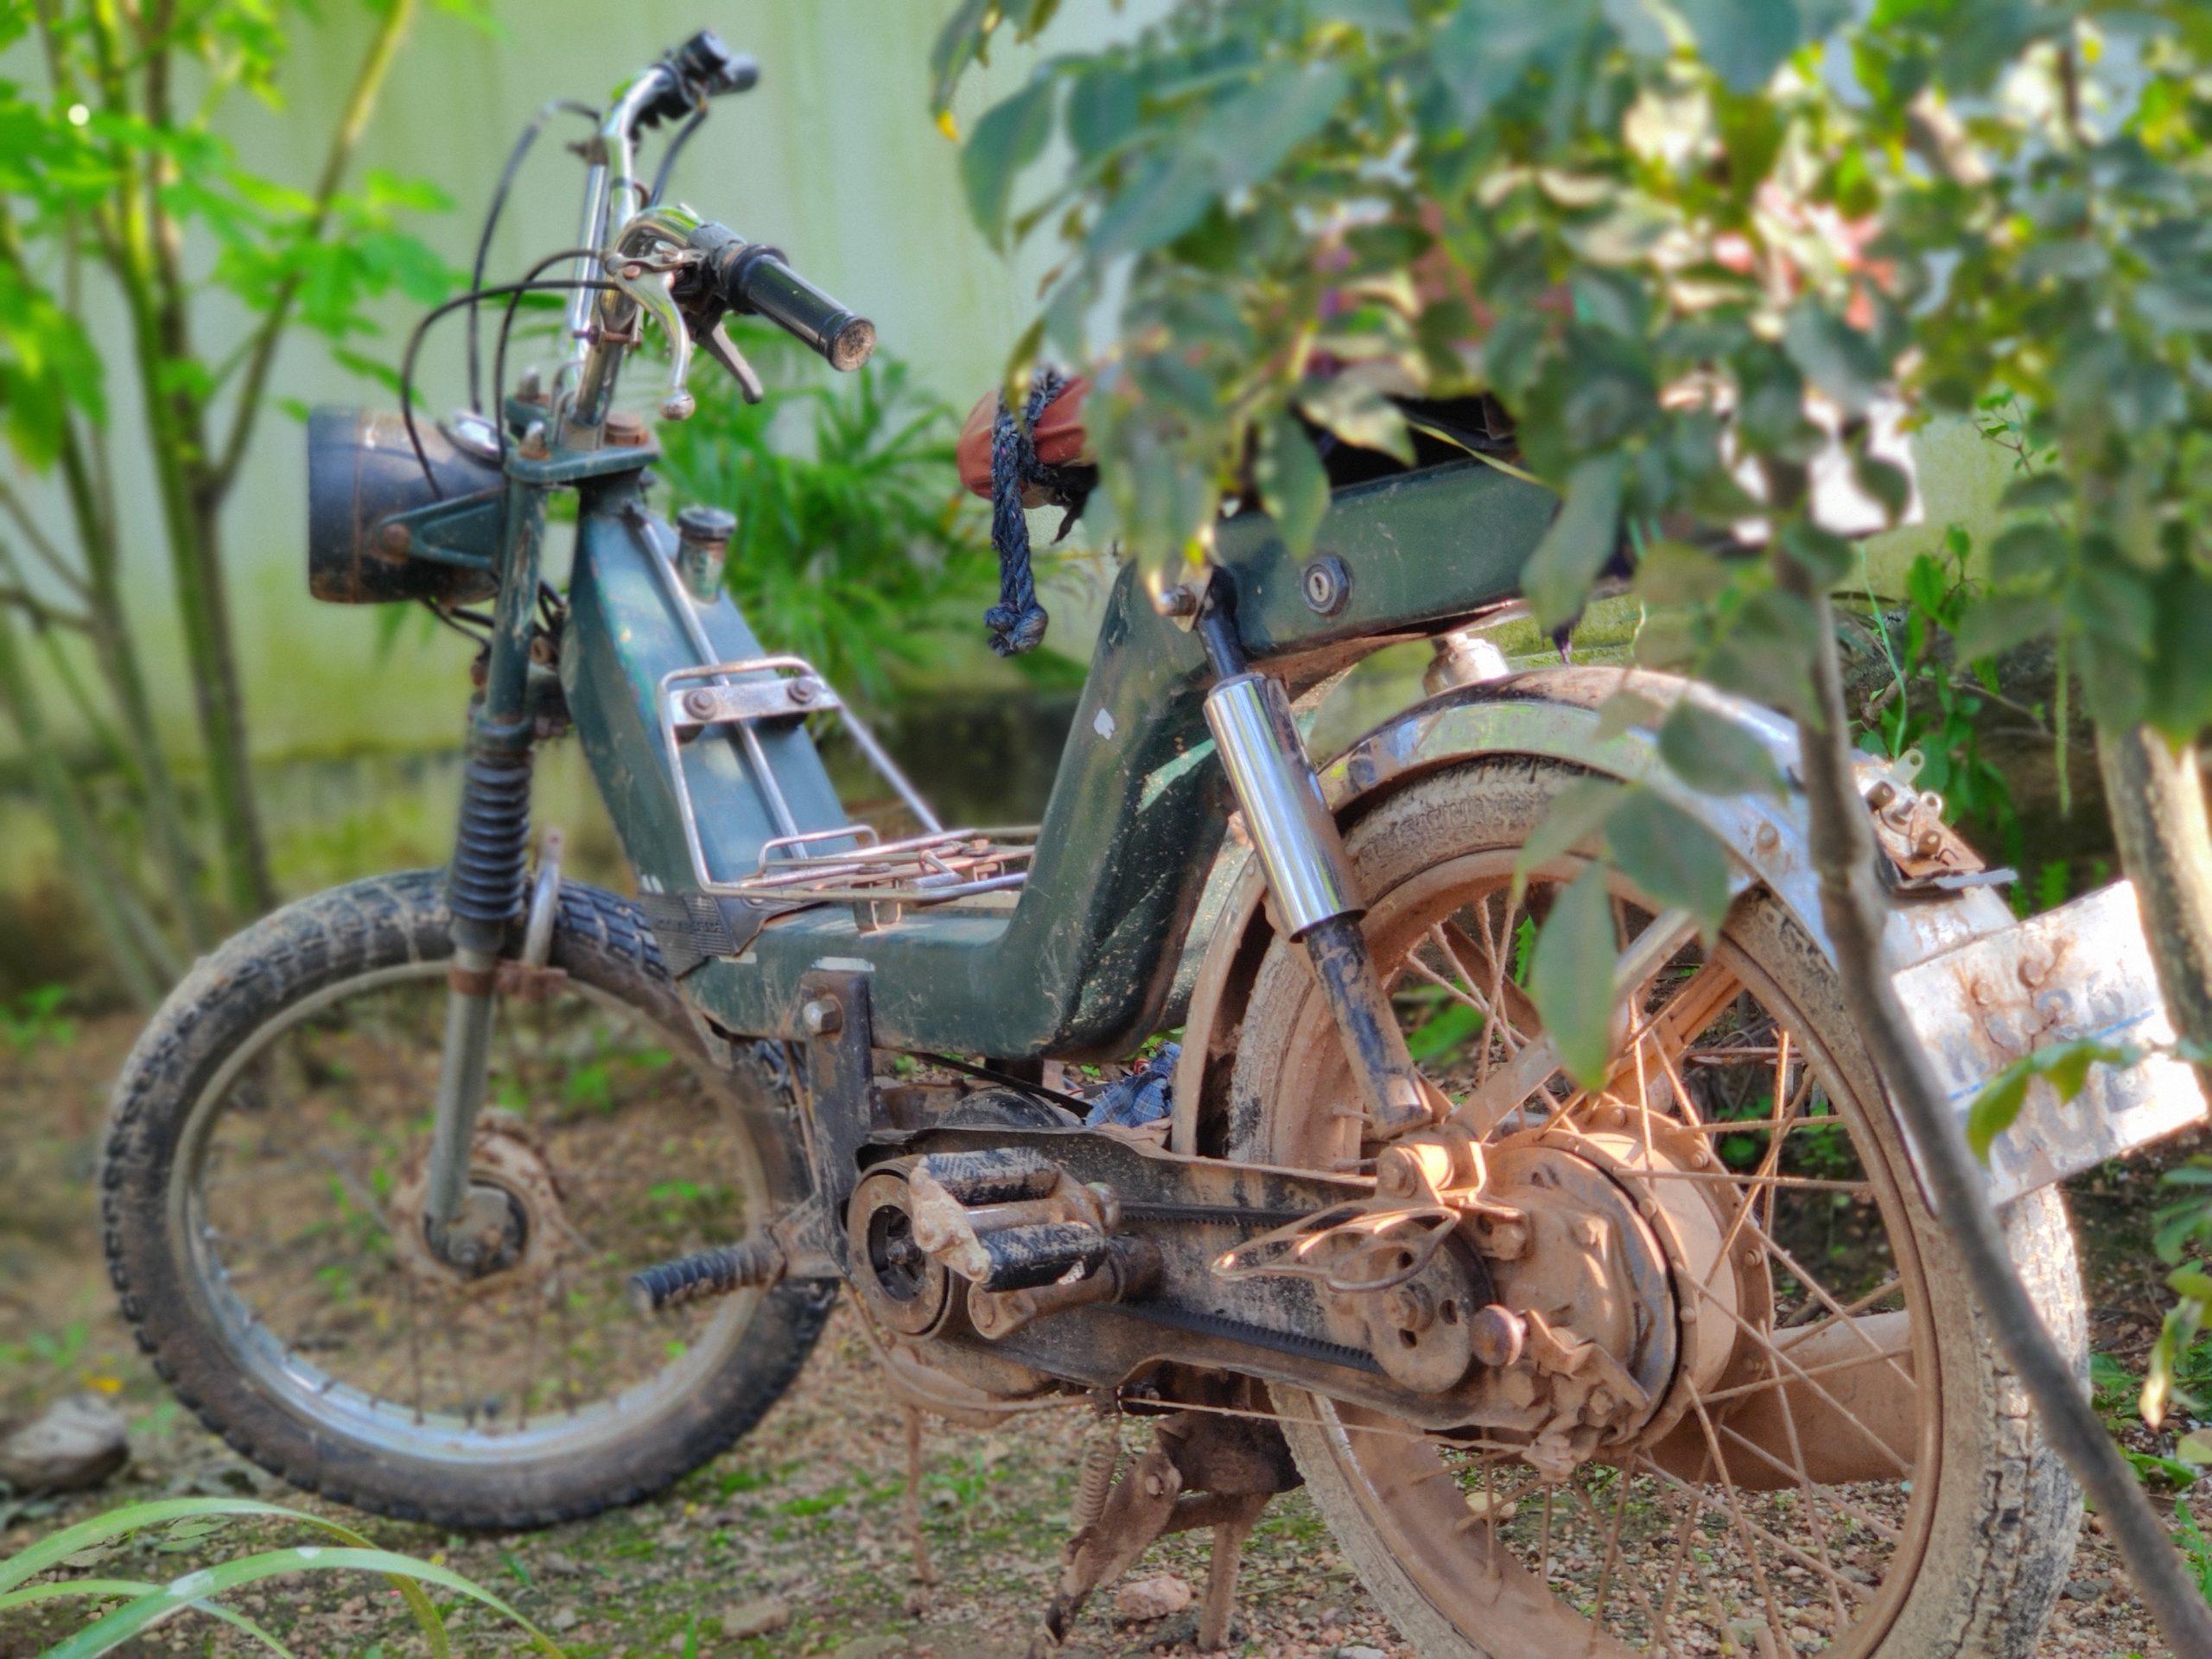 An old moped bike